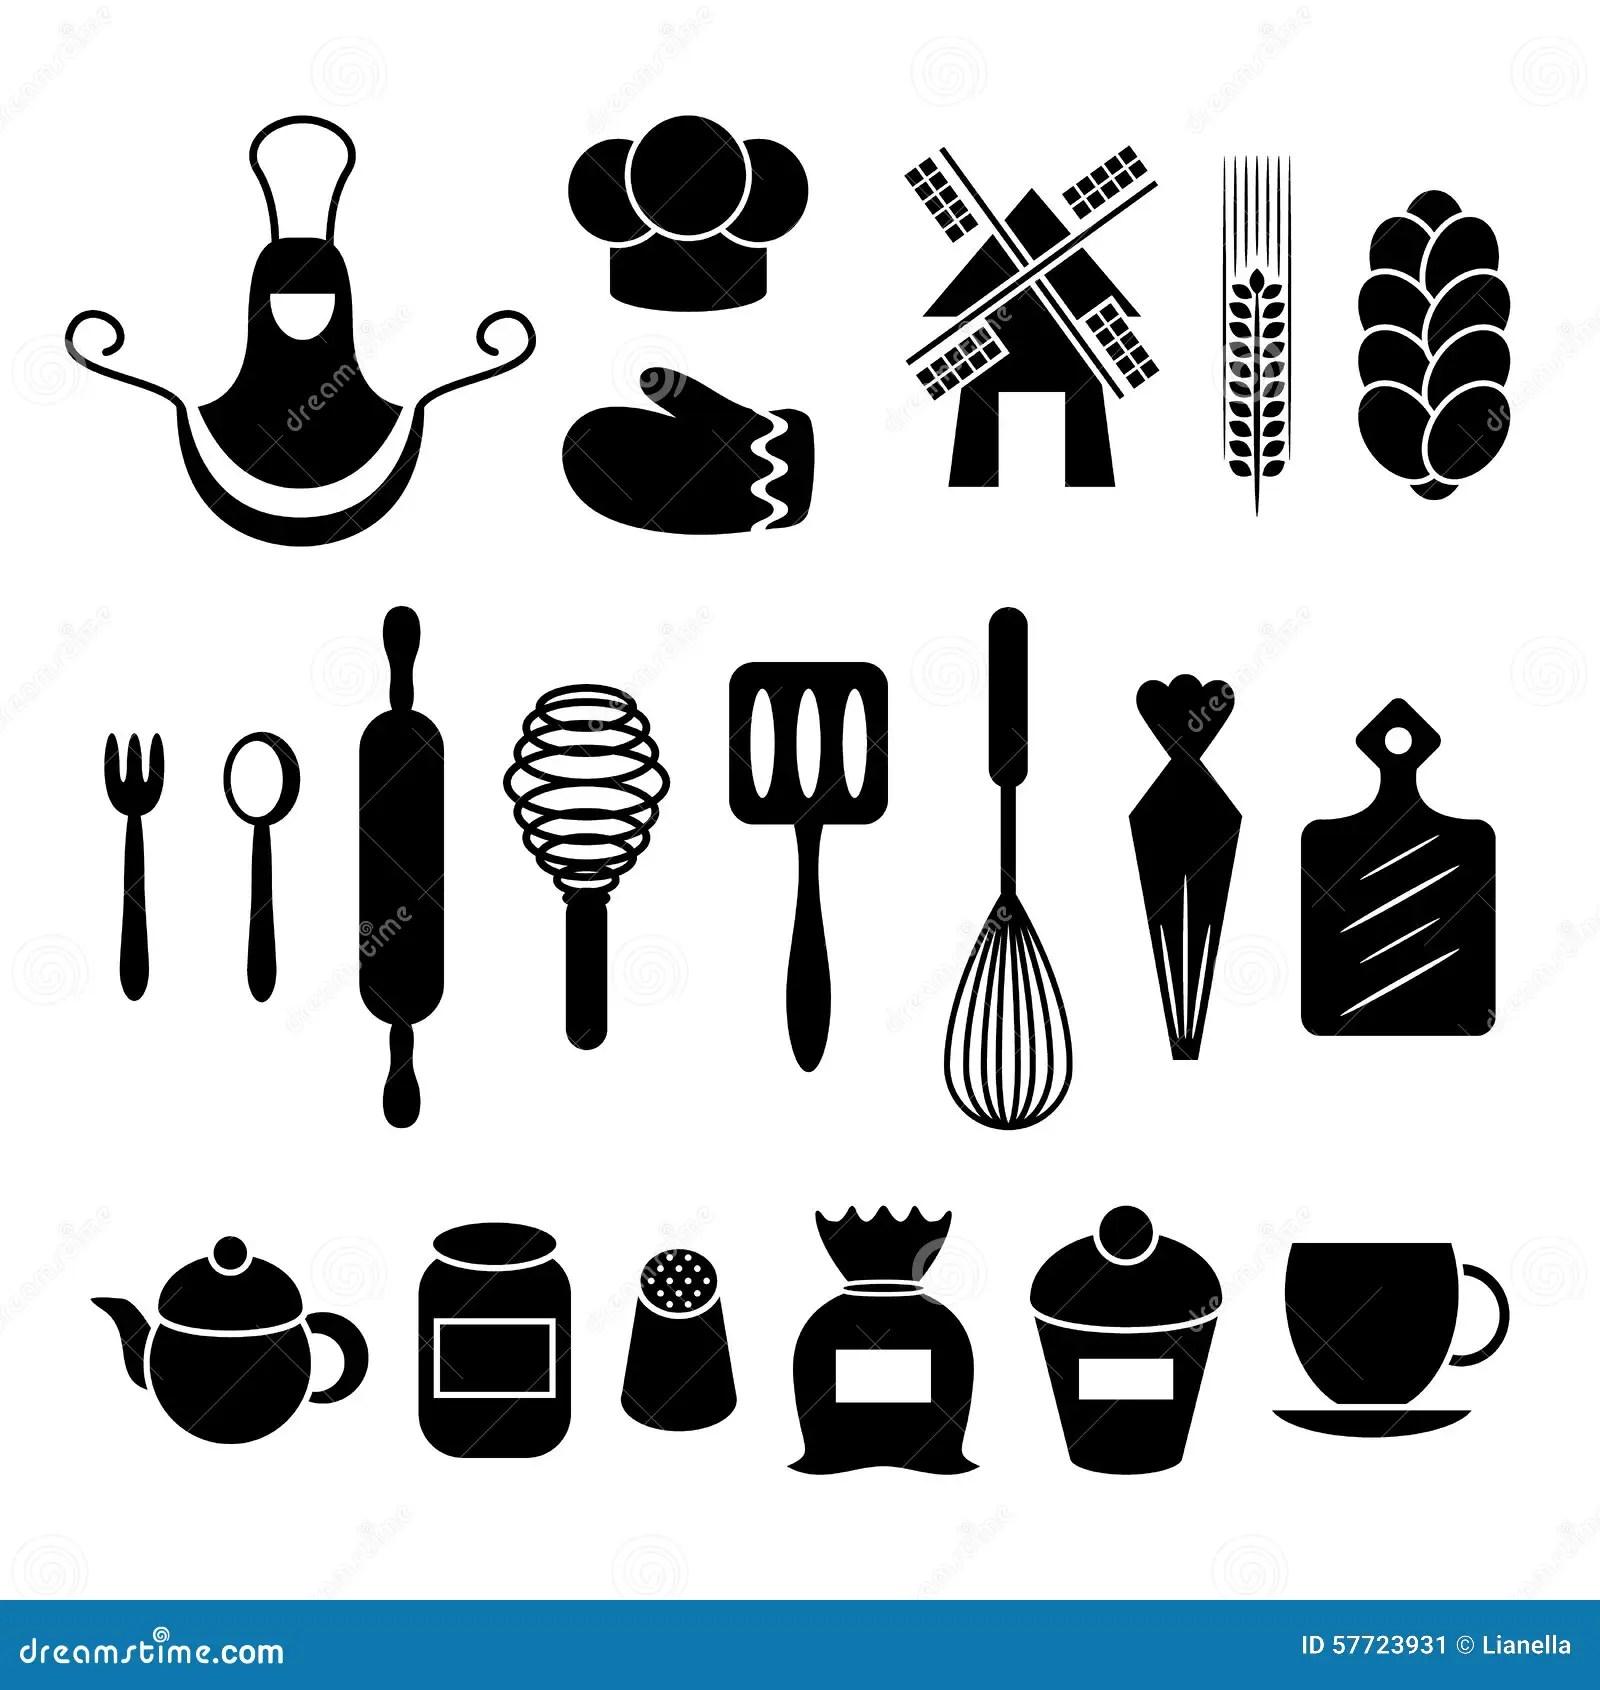 Baking Kitchen Tools Silhouettes Set Stock Vector